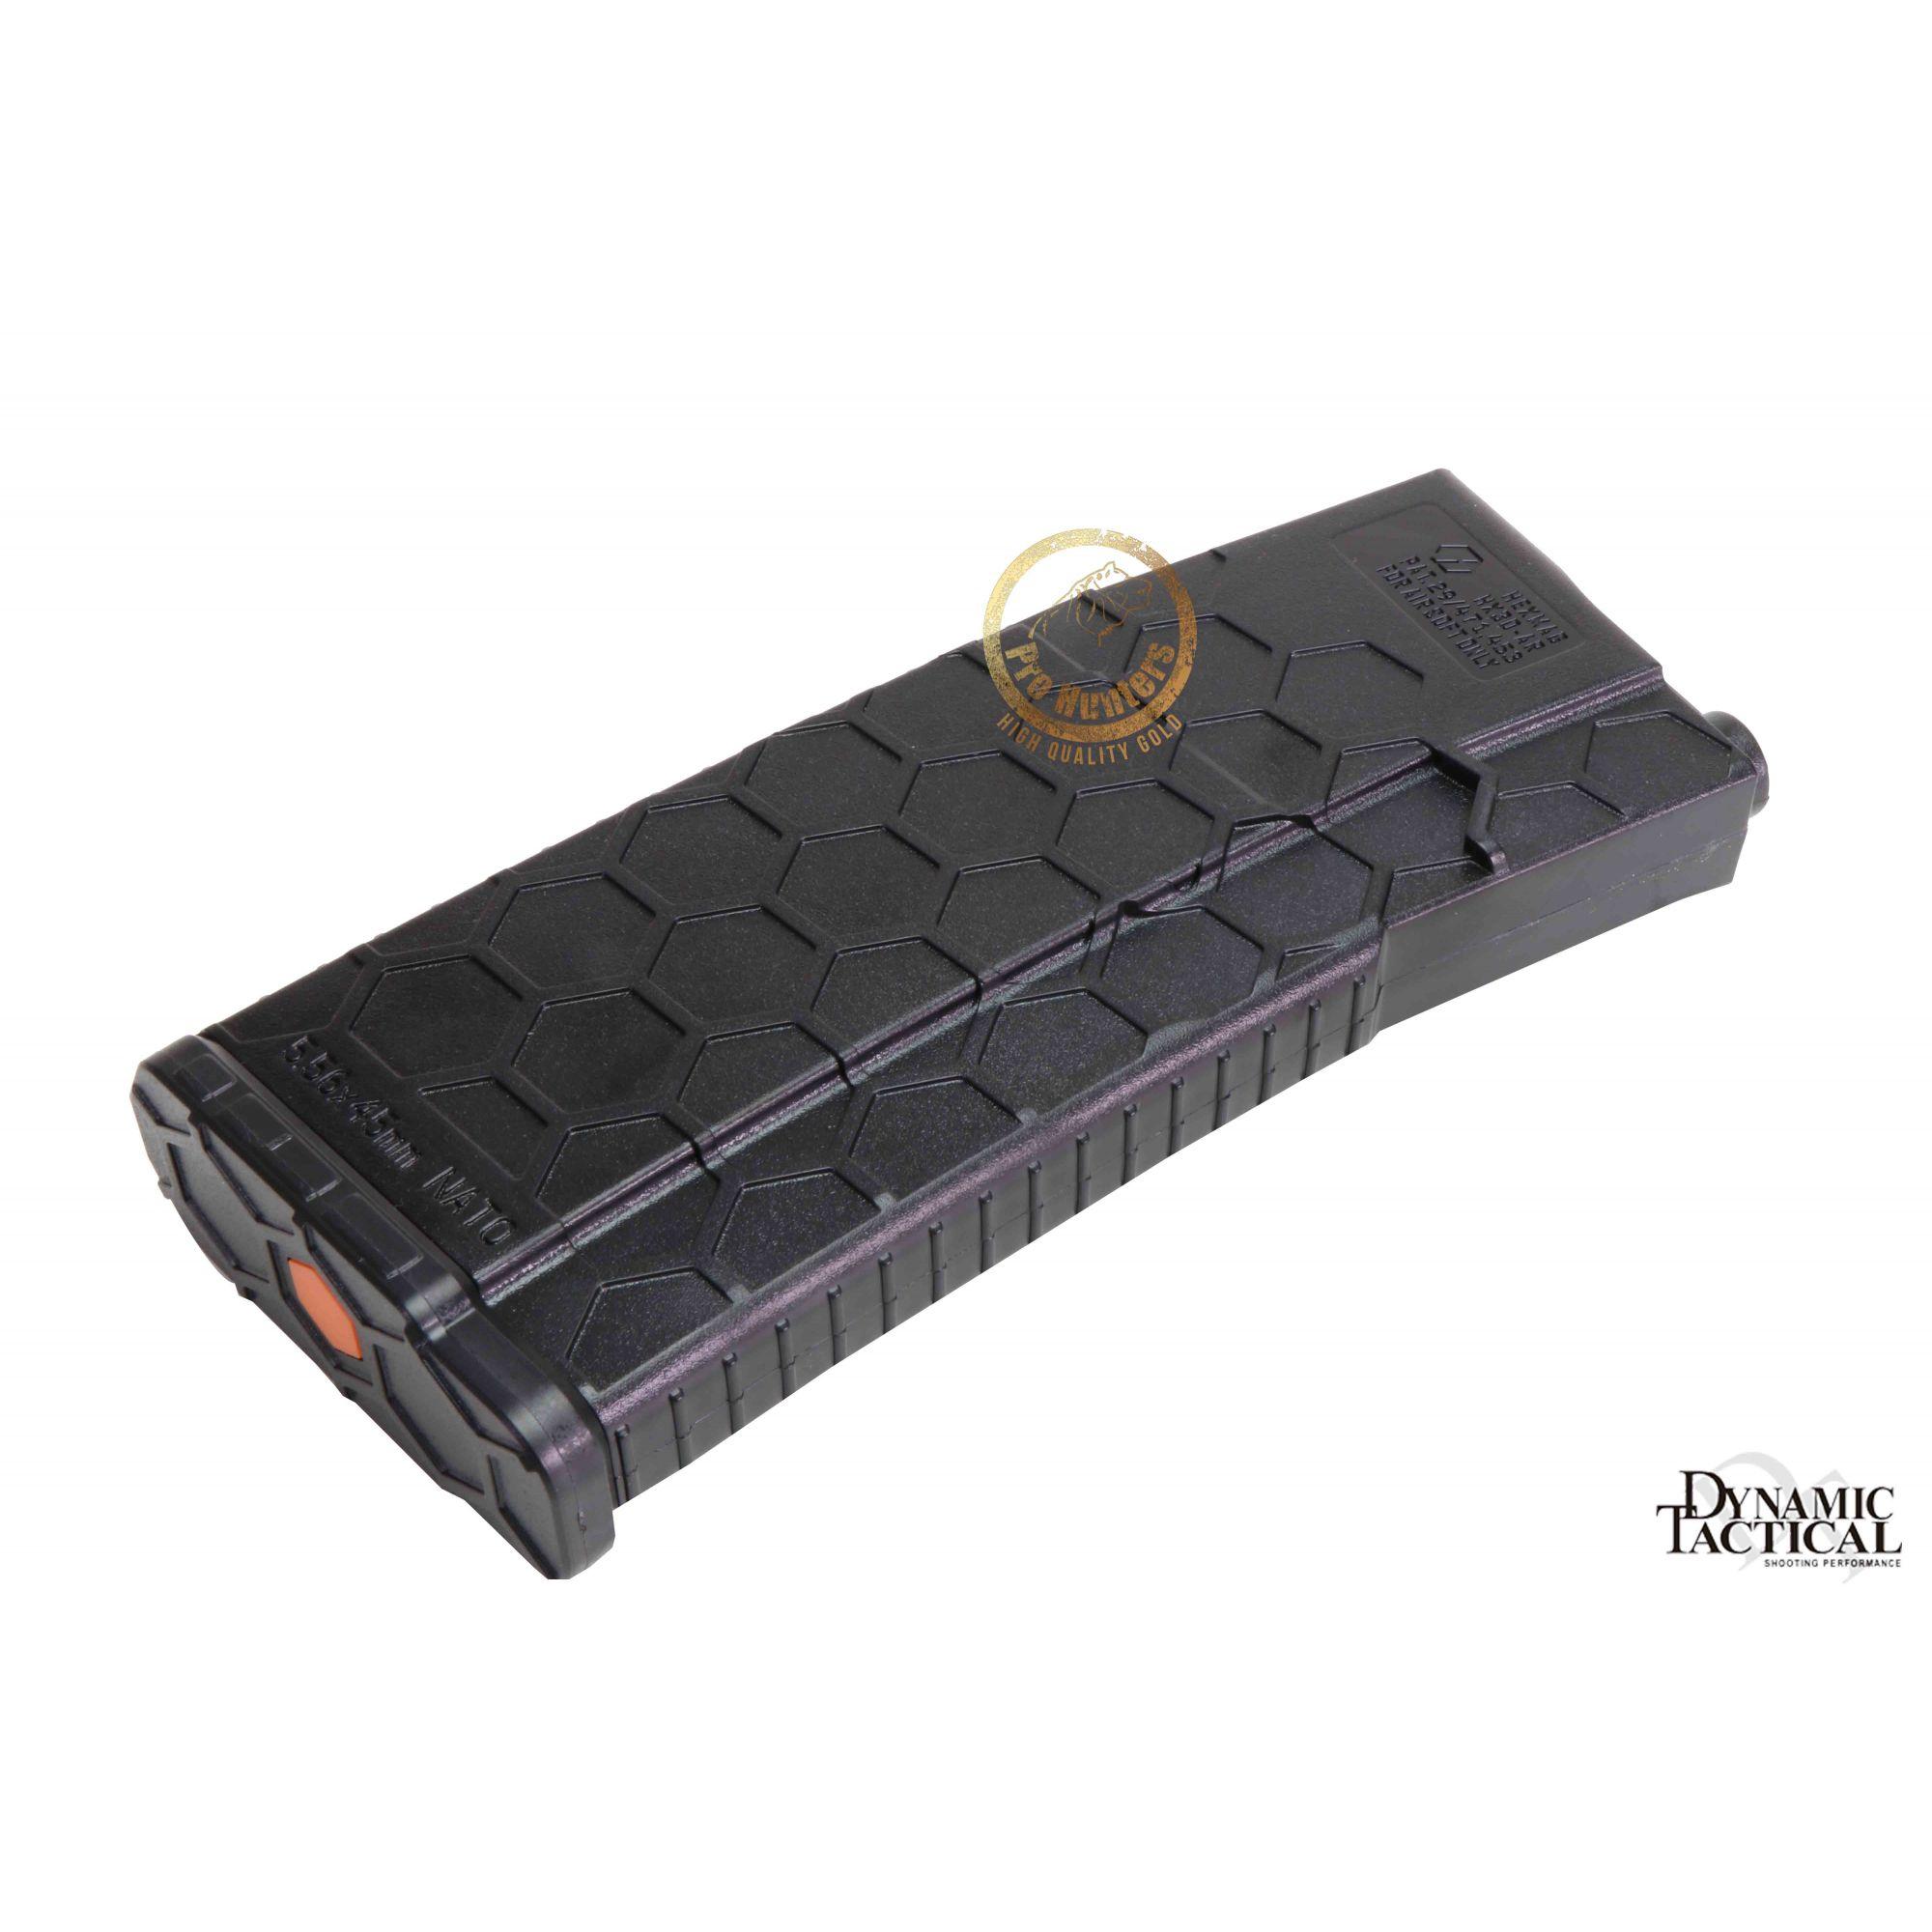 Rifle Airsoft Dytac M4A1 14.5 Pol Carbine Ris - Black